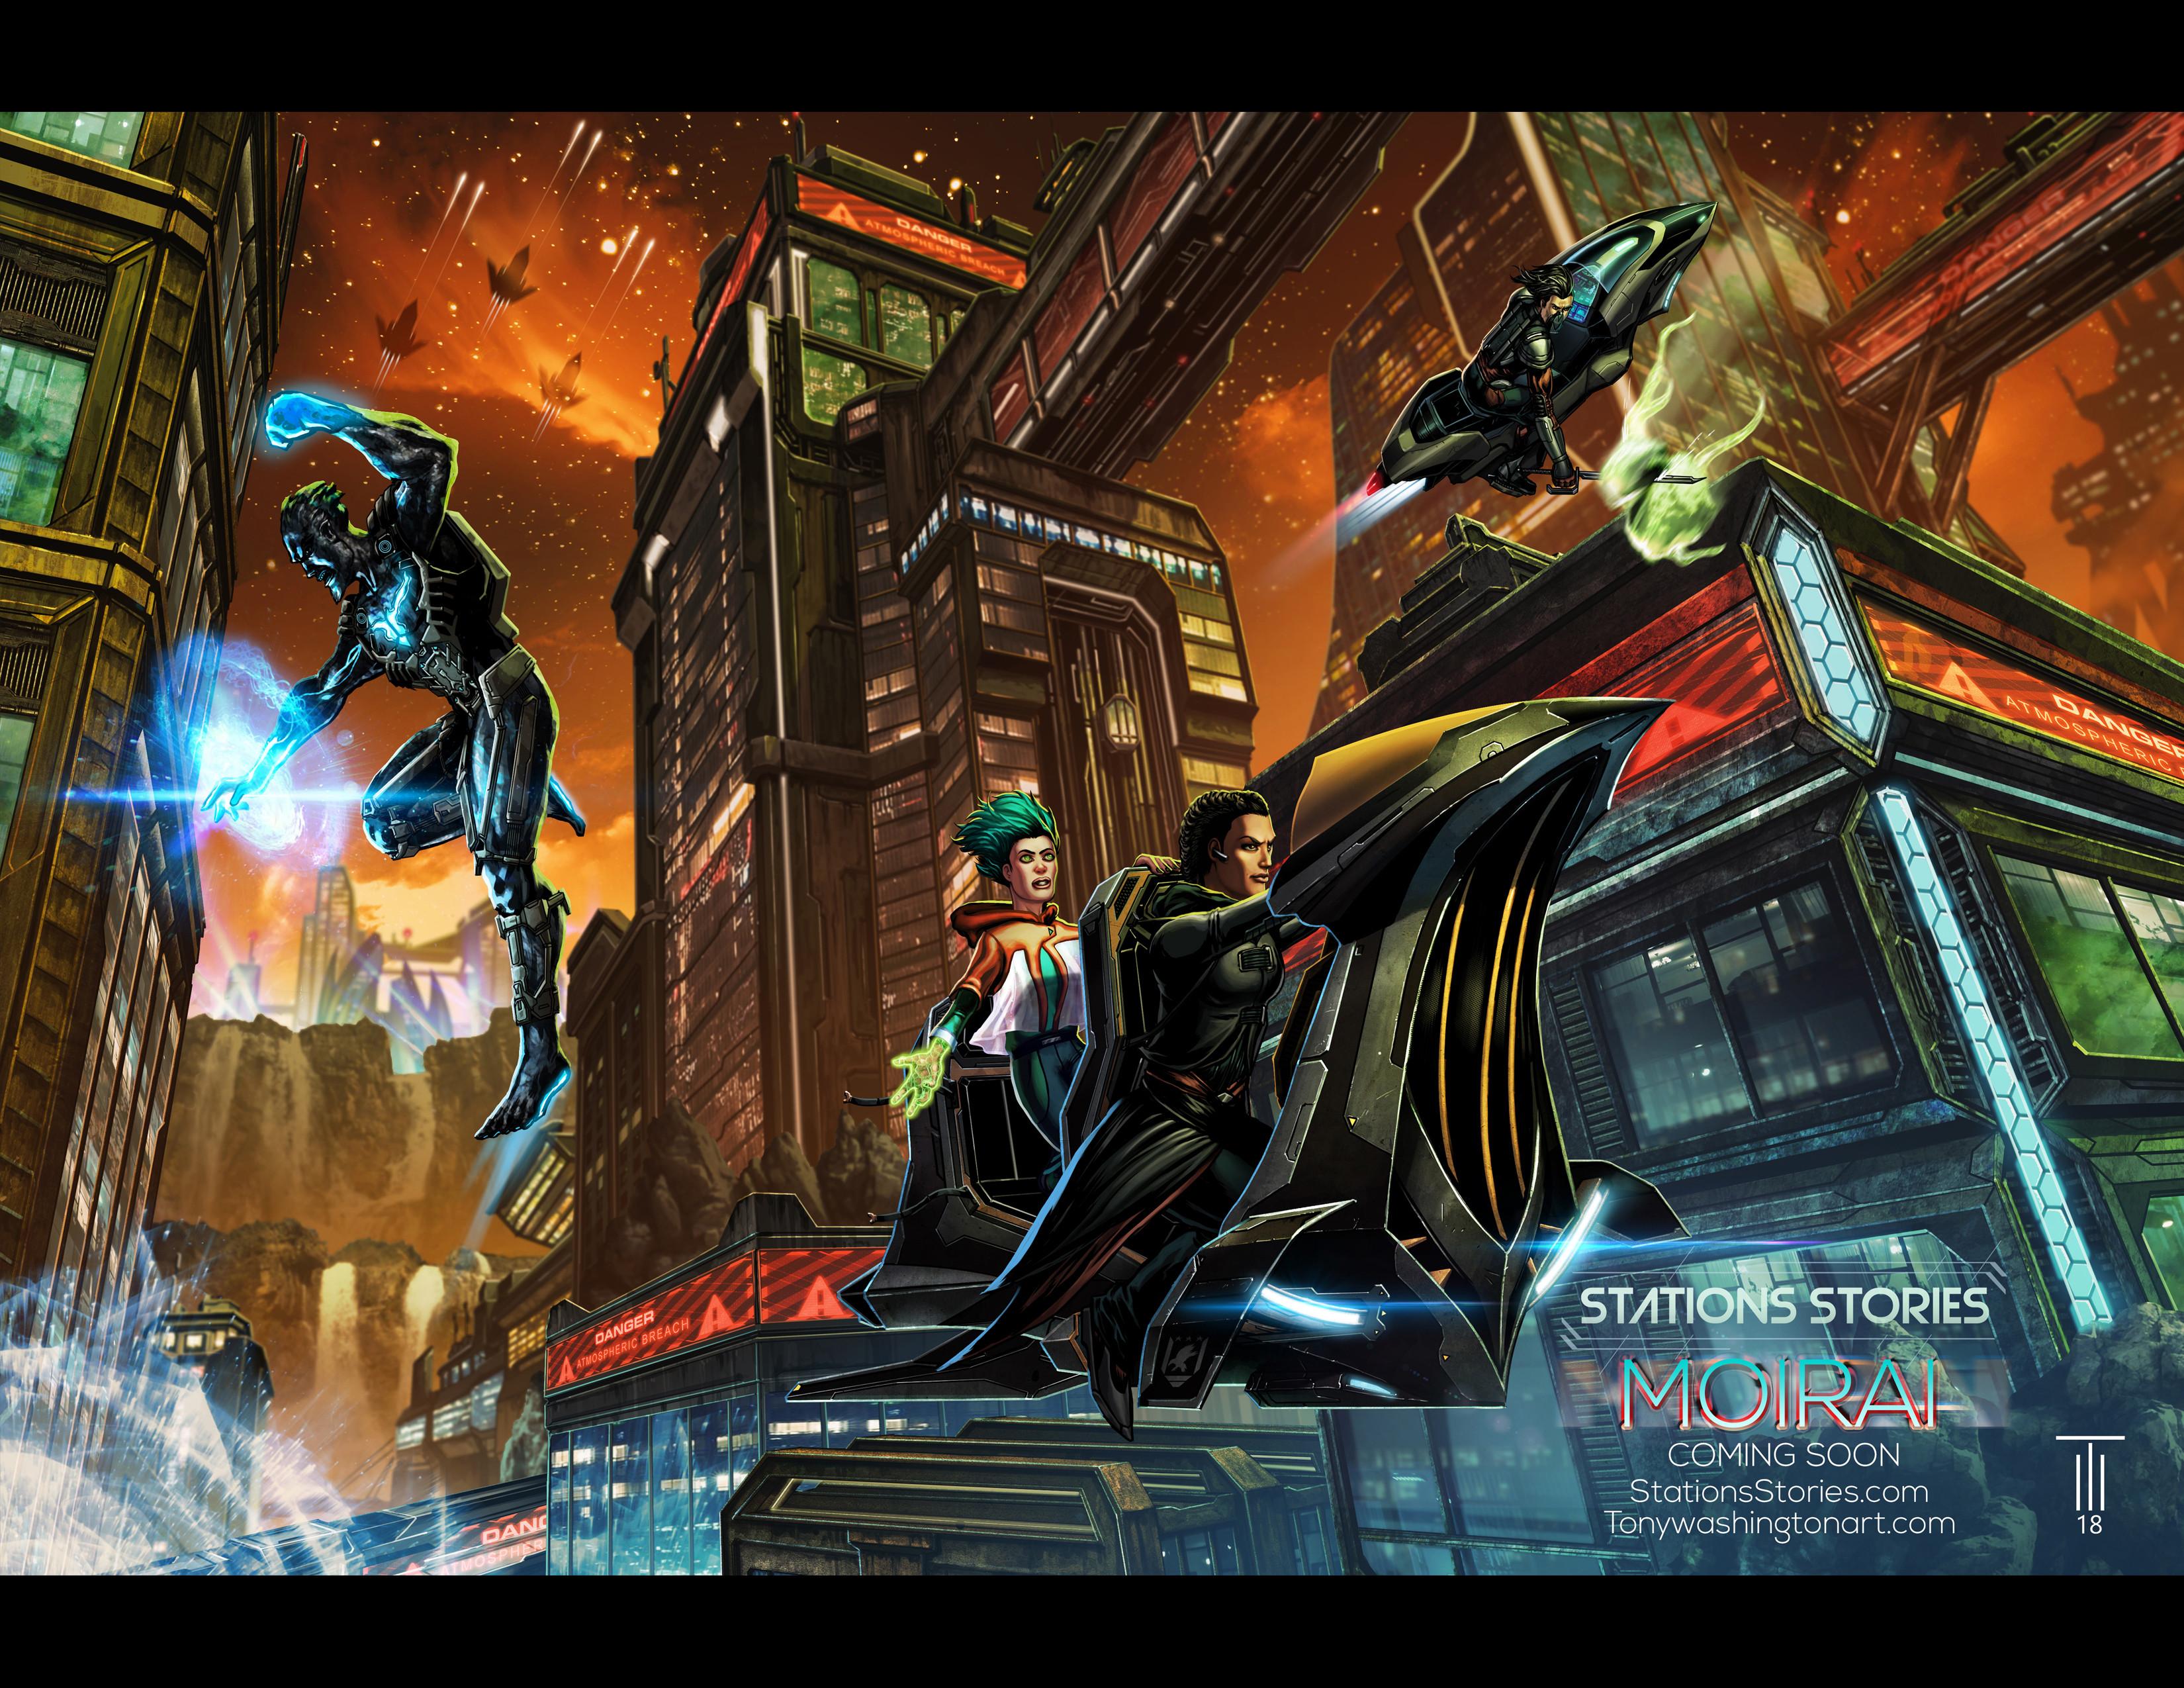 San Diego Comic Con Promo Poster (Table FF-22 Artist Alley)